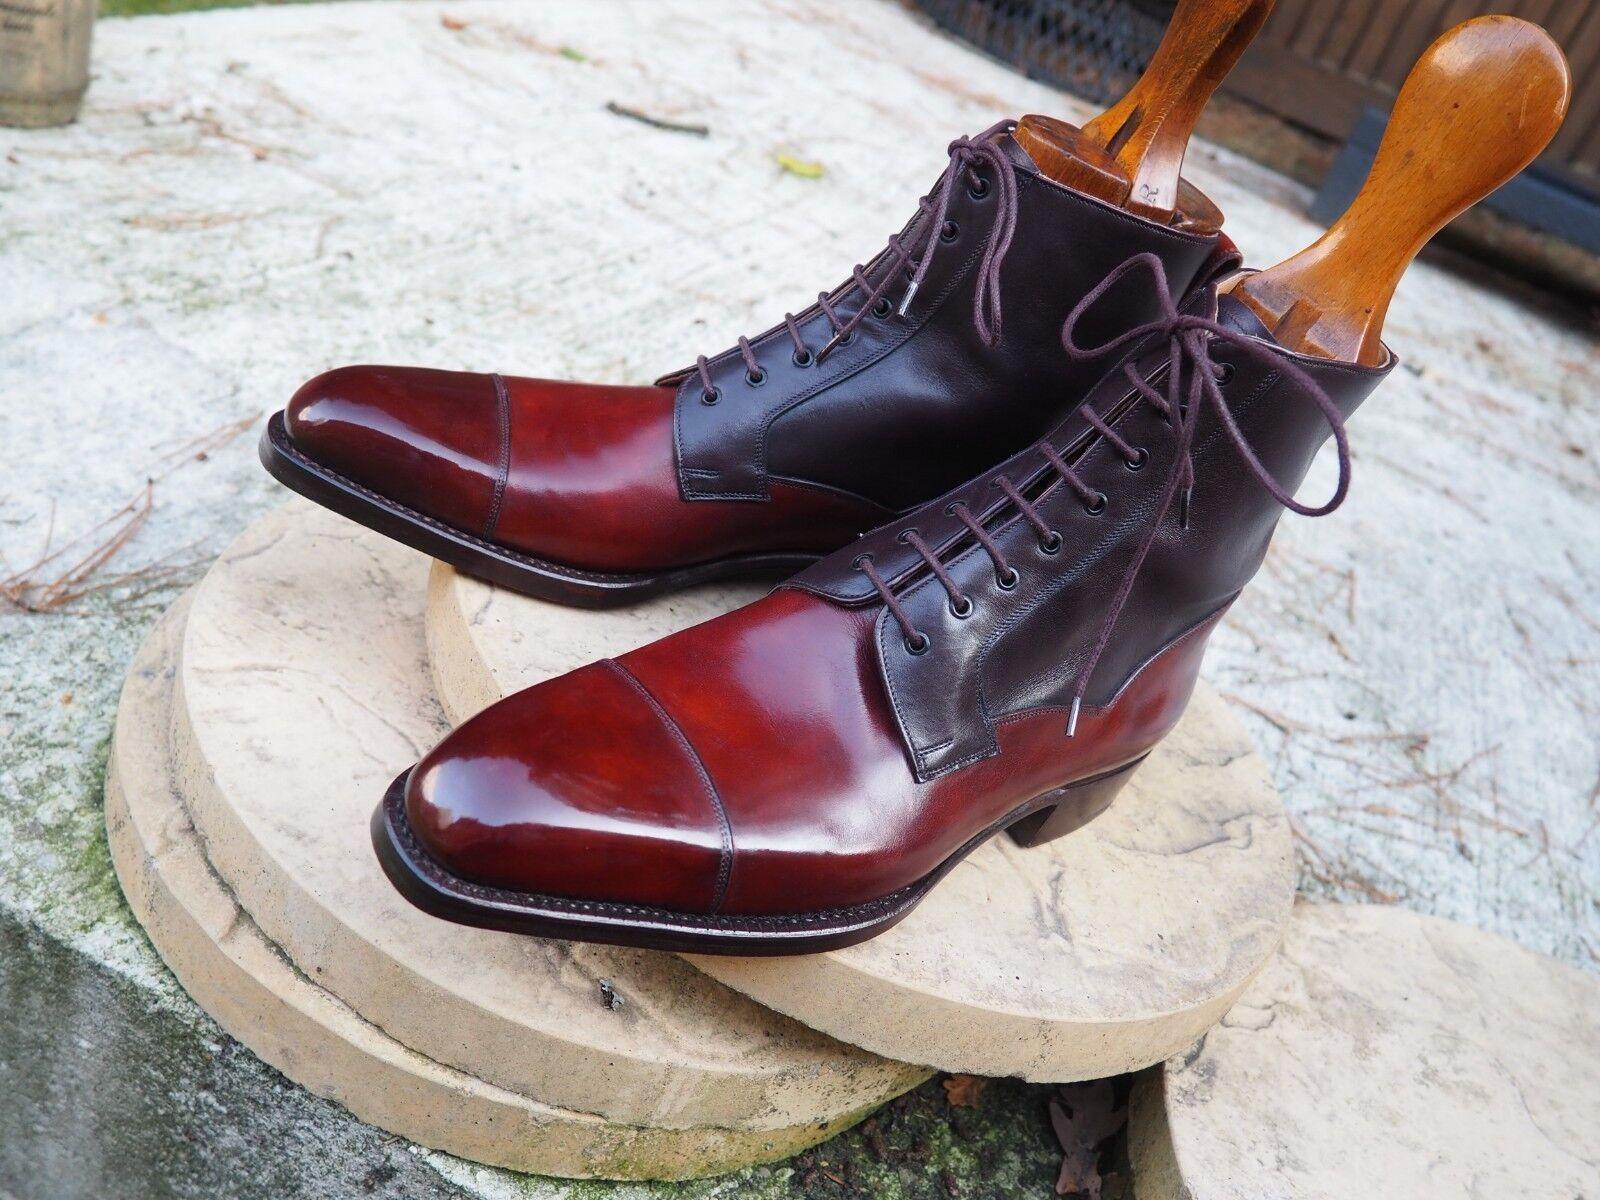 Vass Derby Boots Boots Derby - Gold Mus & Oxblood - US 11 D - K last. 82ef03